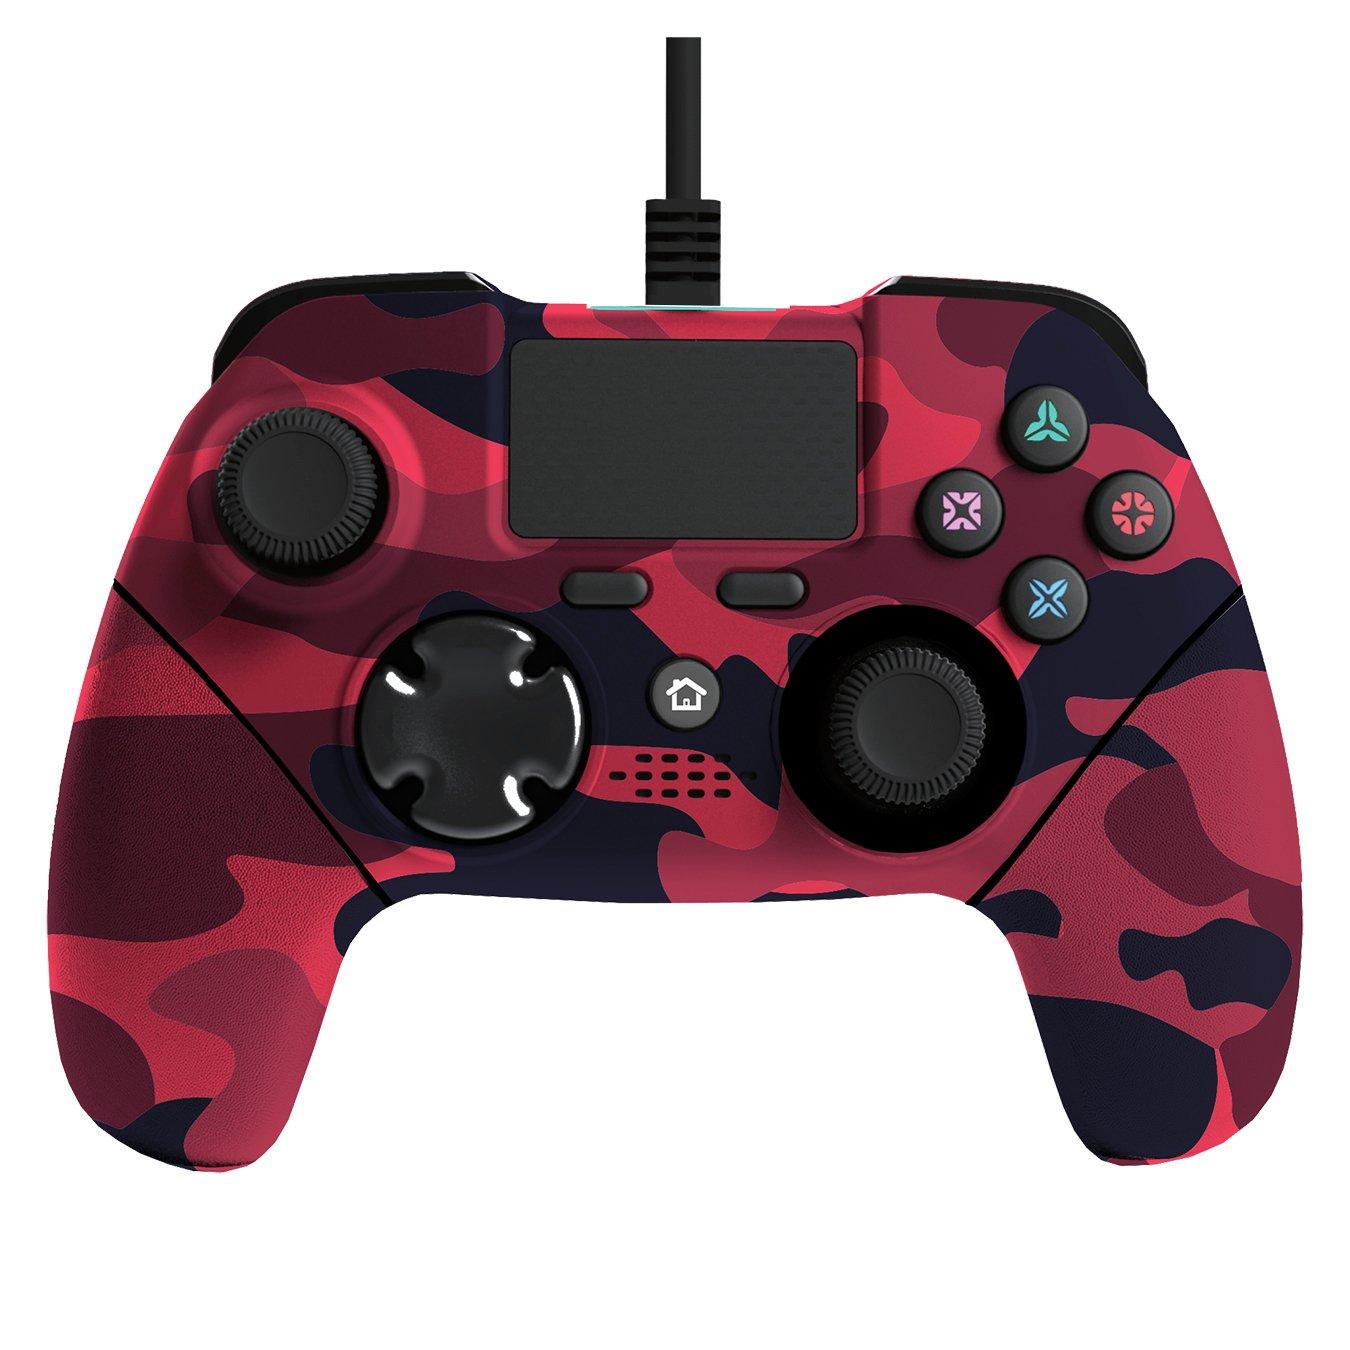 Mayhem MK1 PS4 Controller Pre-Order - Red Camo